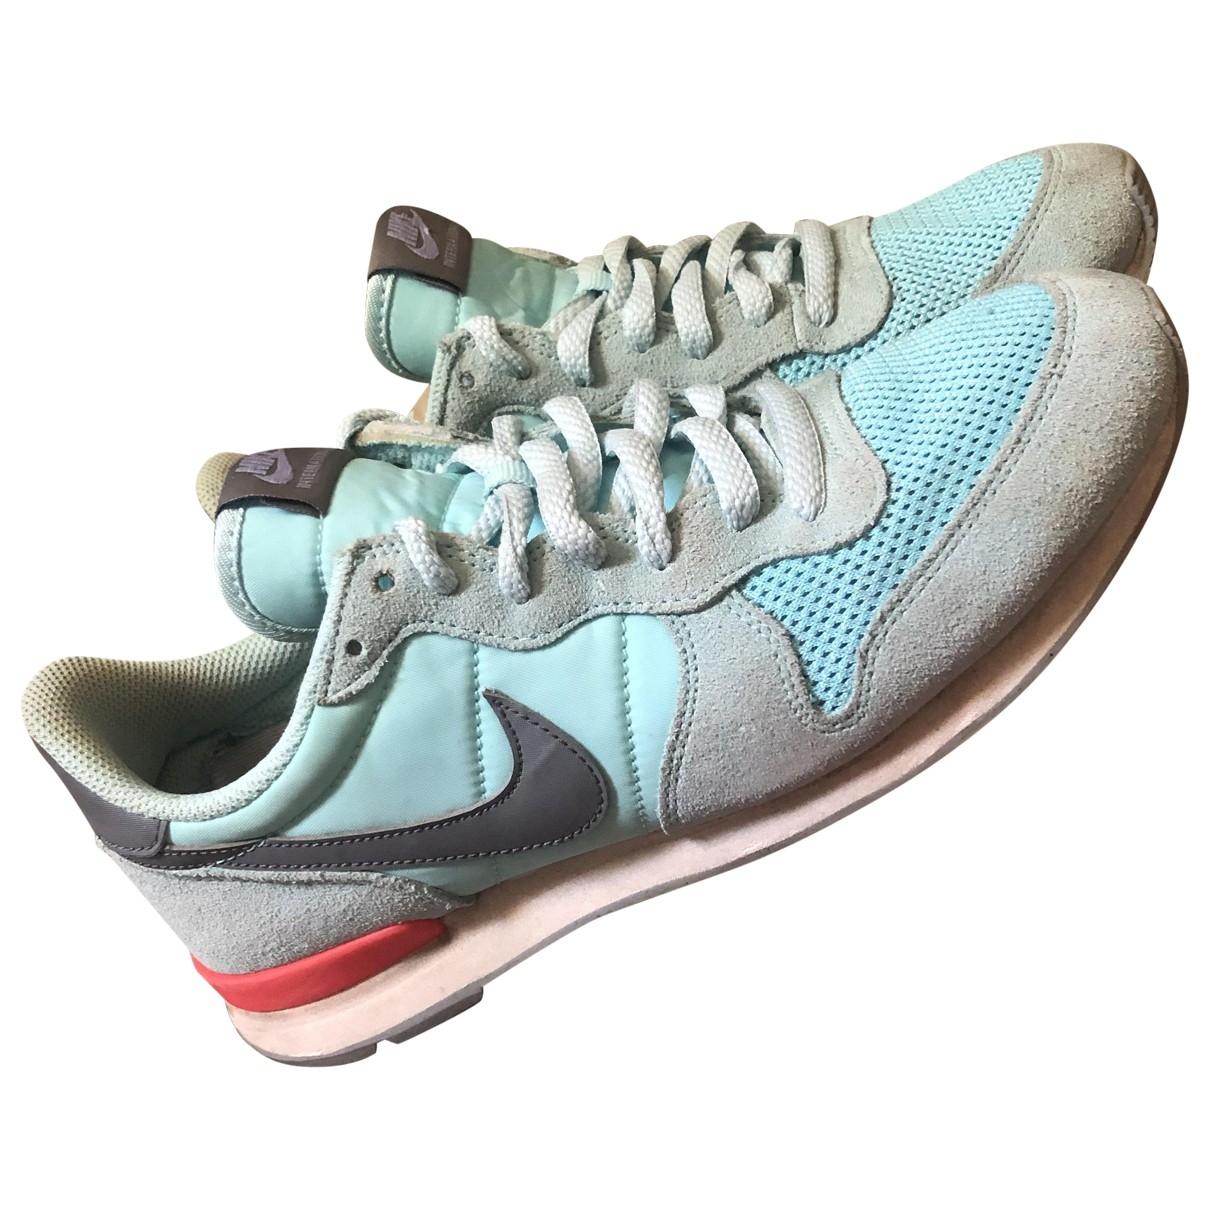 Nike Internationalist Turquoise Cloth Trainers for Women 40.5 EU